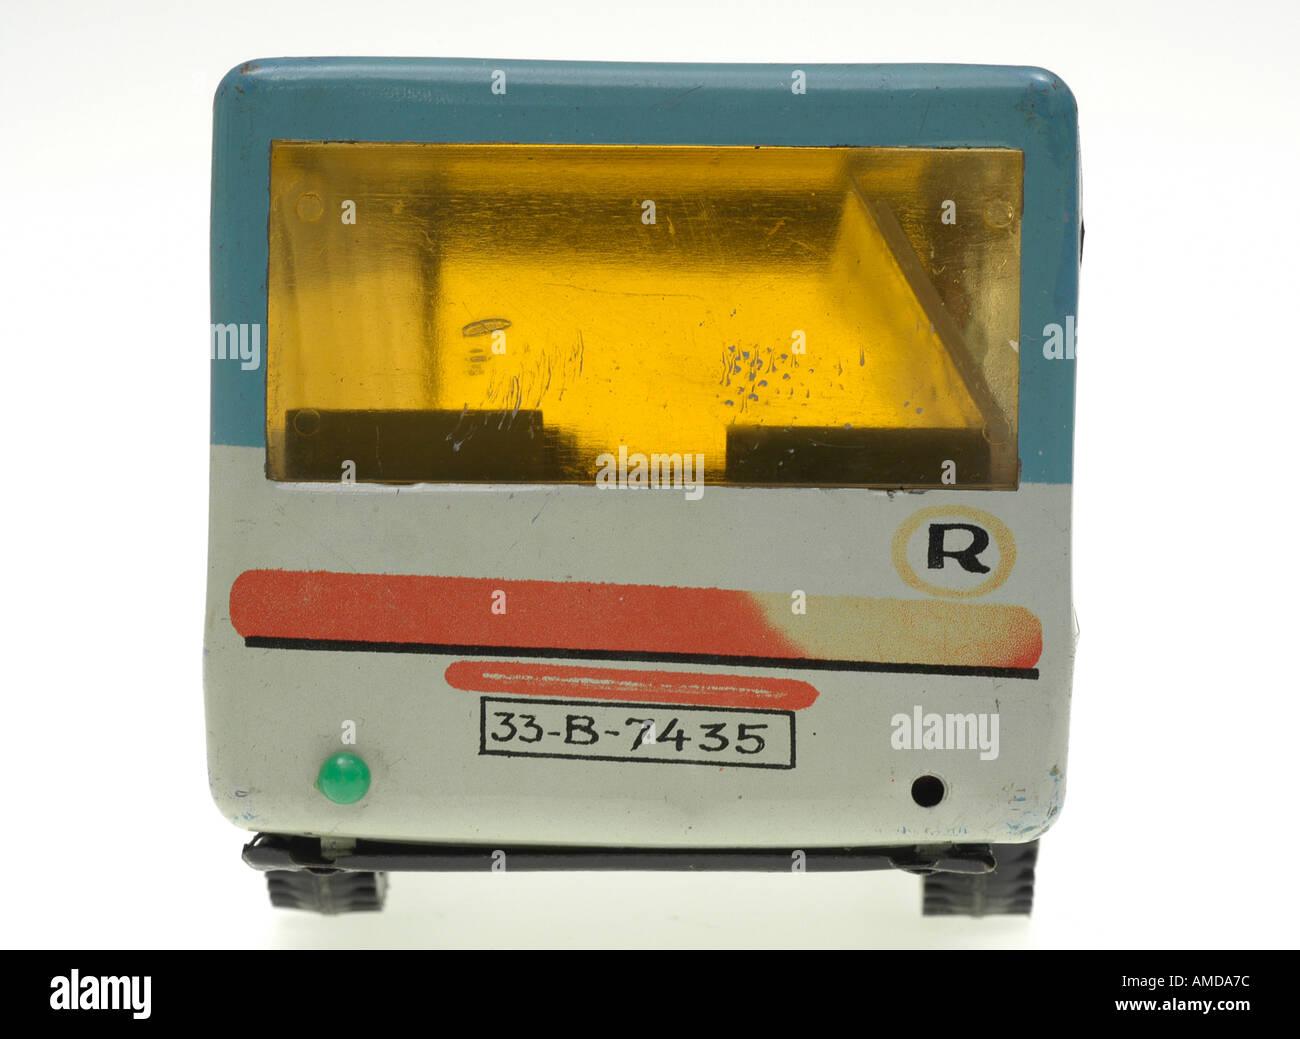 autobus, toy, eastern enlargement Stock Photo